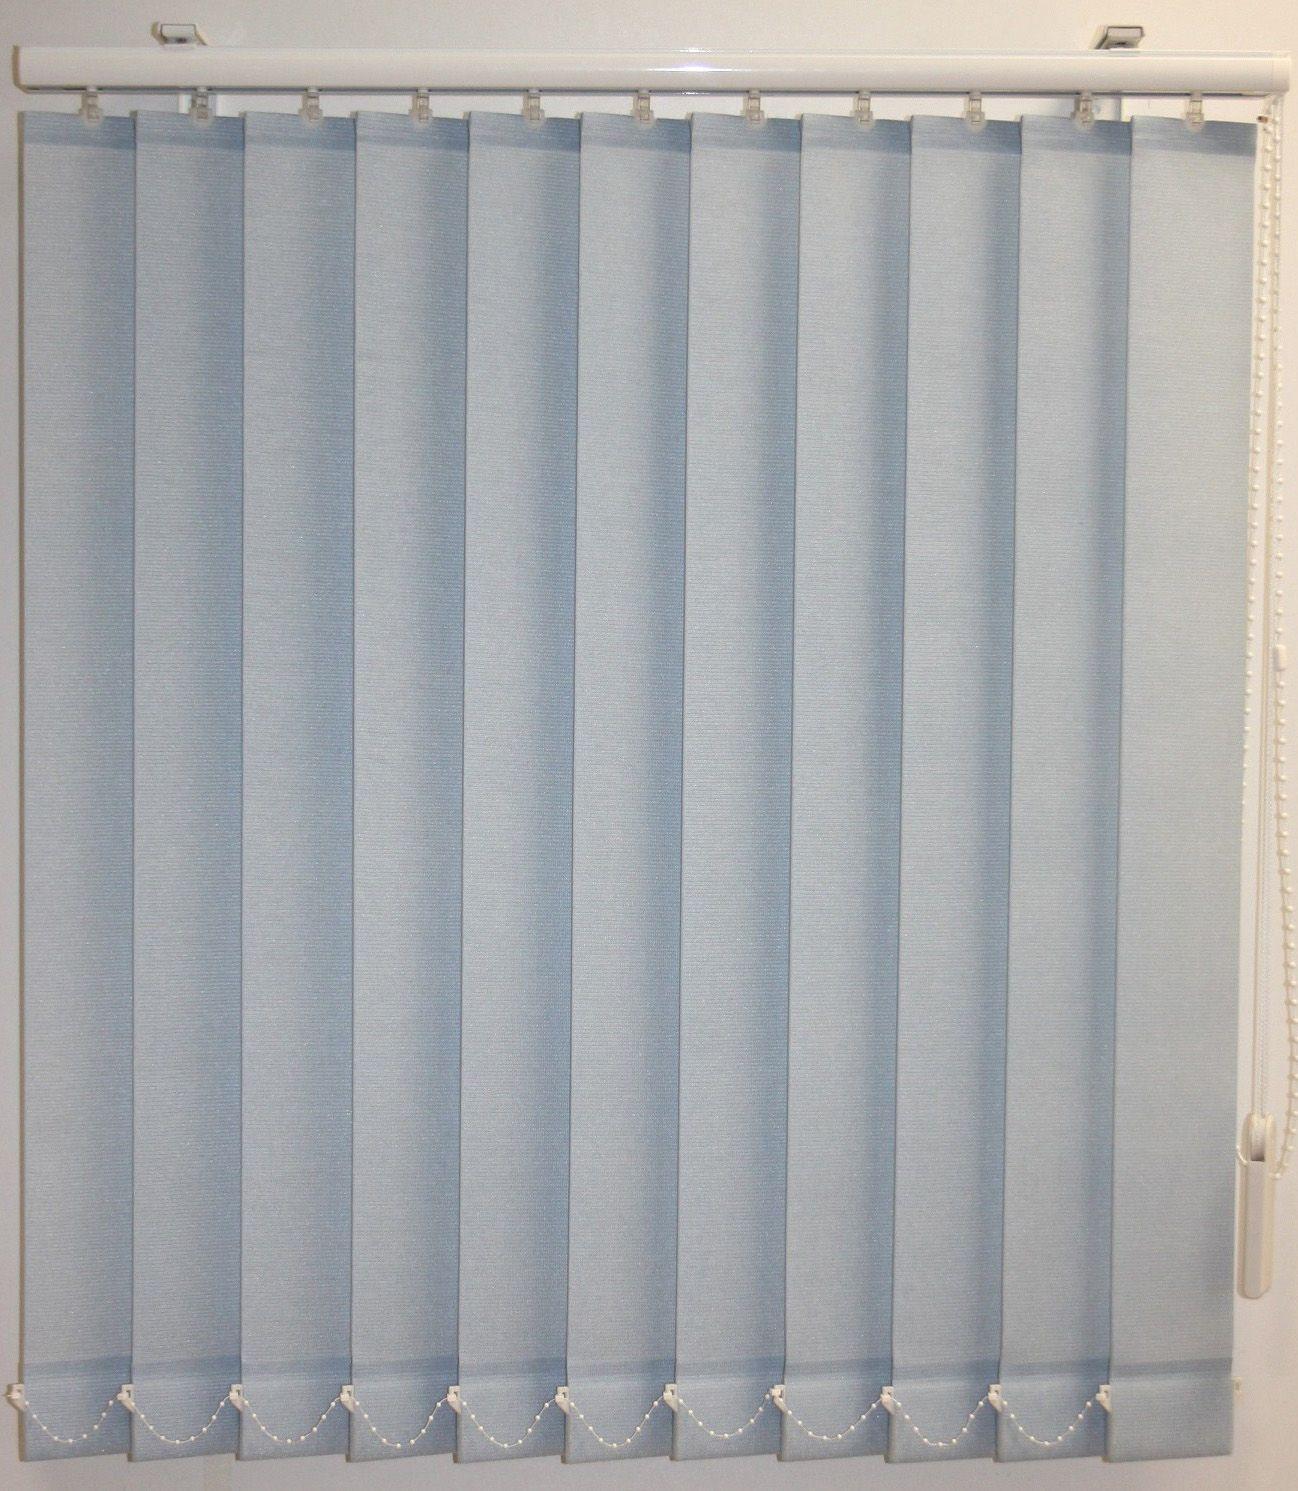 vertikal lamellenvorhang sunlines aenne mit 89 mm lamellen im wunschma schwab versand. Black Bedroom Furniture Sets. Home Design Ideas